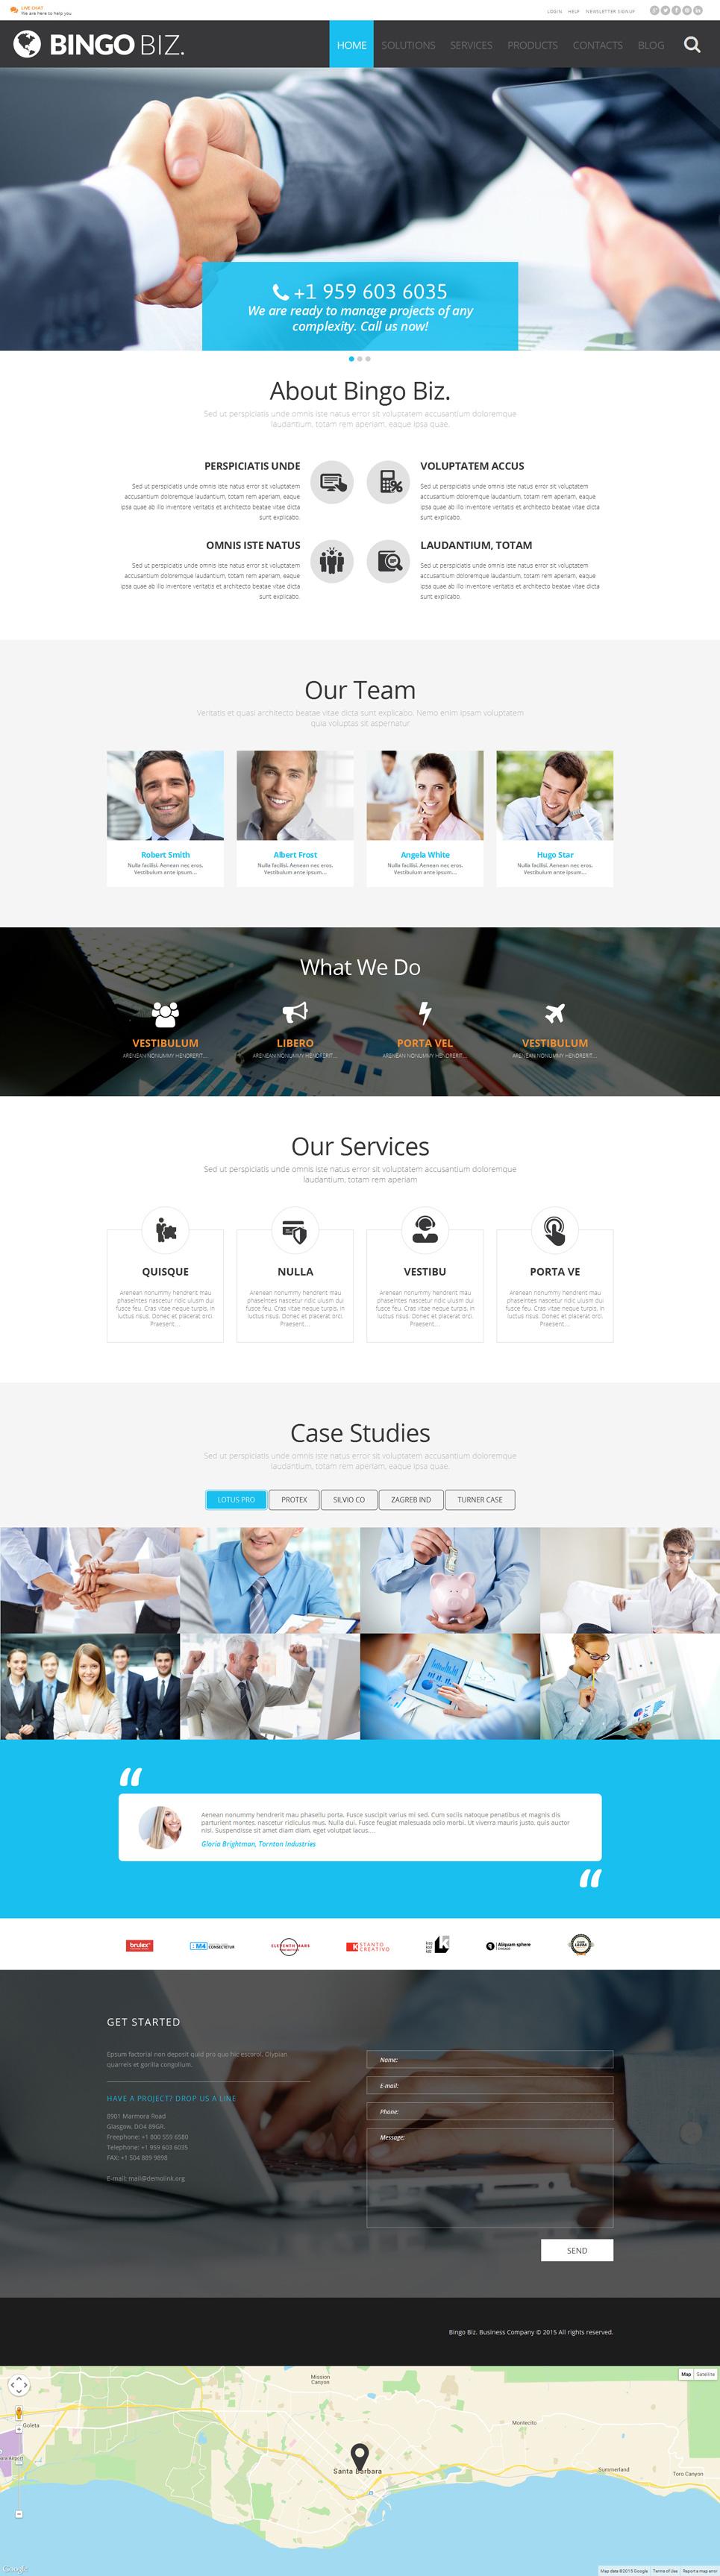 Адаптивный шаблон сайта на тему бизнес и услуги #53091